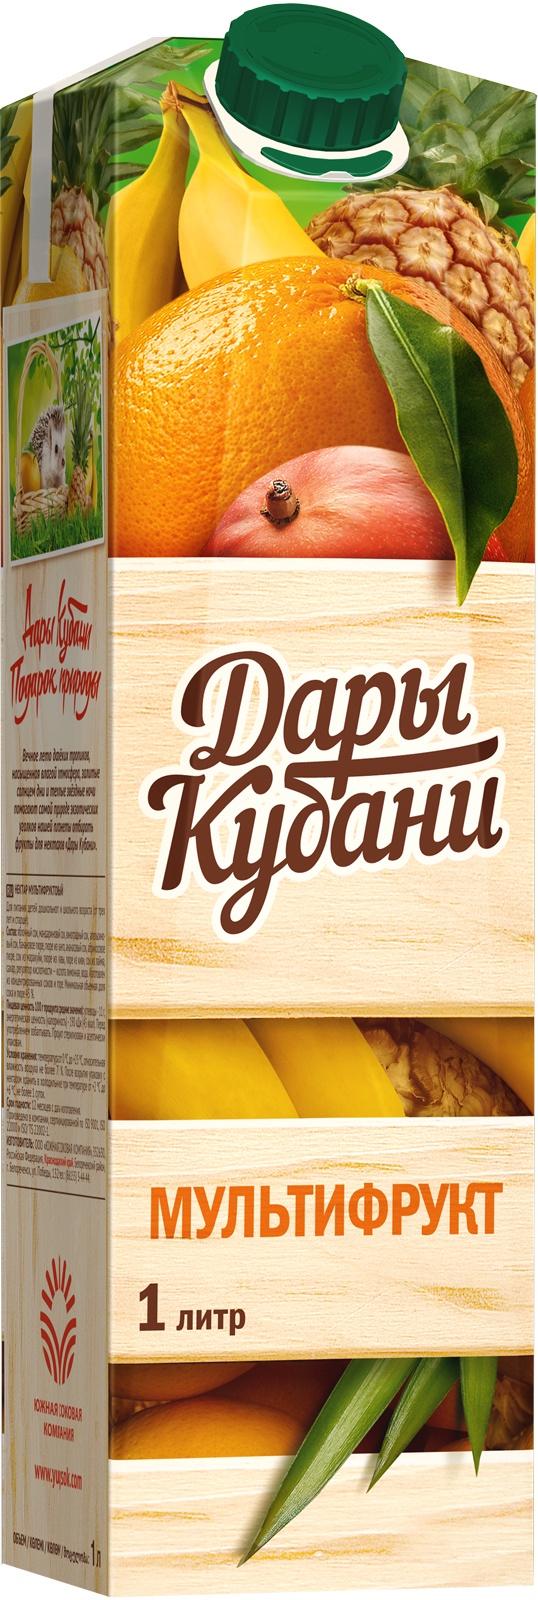 Нектар Дары Кубани мультифруктовый 1 л менк персиковый нектар 1 л